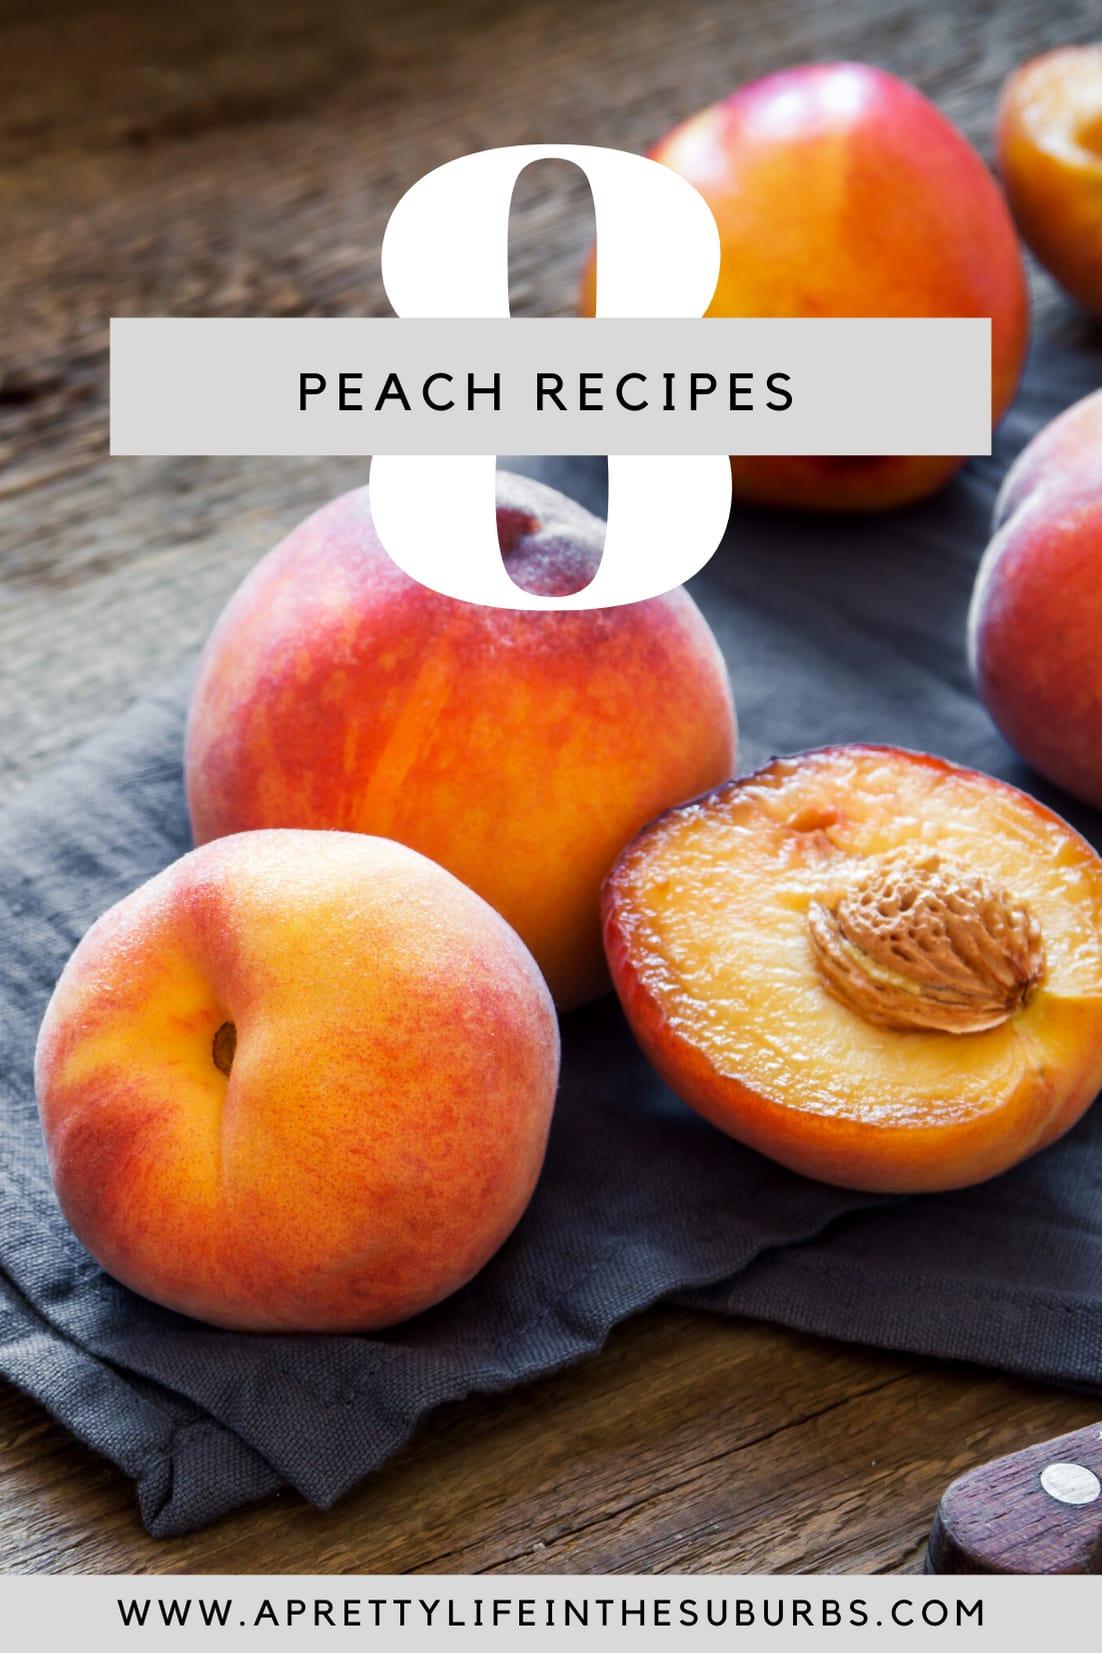 8+ Peach Recipes